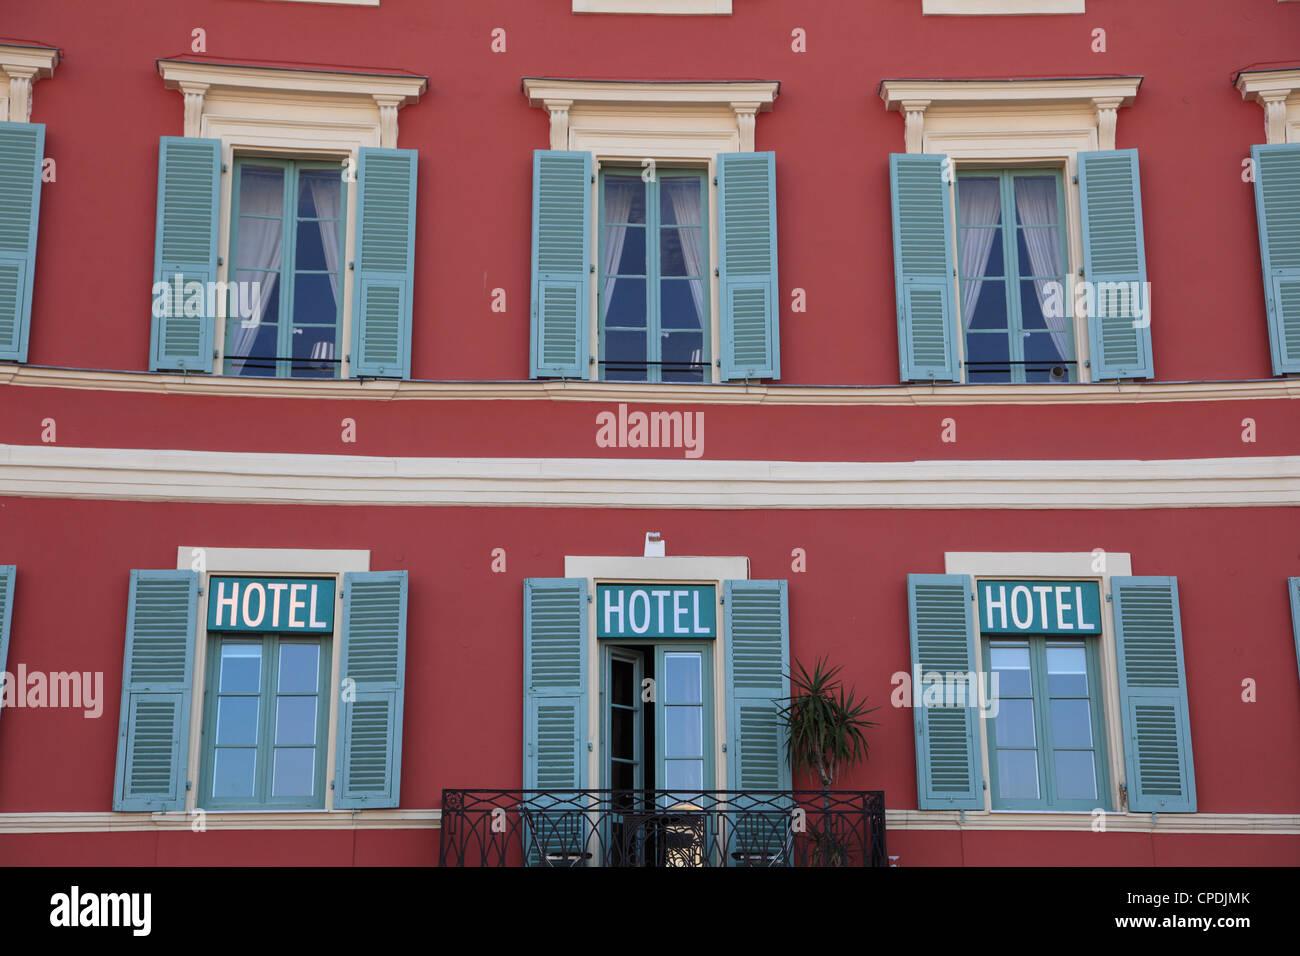 Hotel, Place Massena, Nice, Alpes Maritimes, Cote d'Azur, French Riviera, Provence, France, Europe - Stock Image